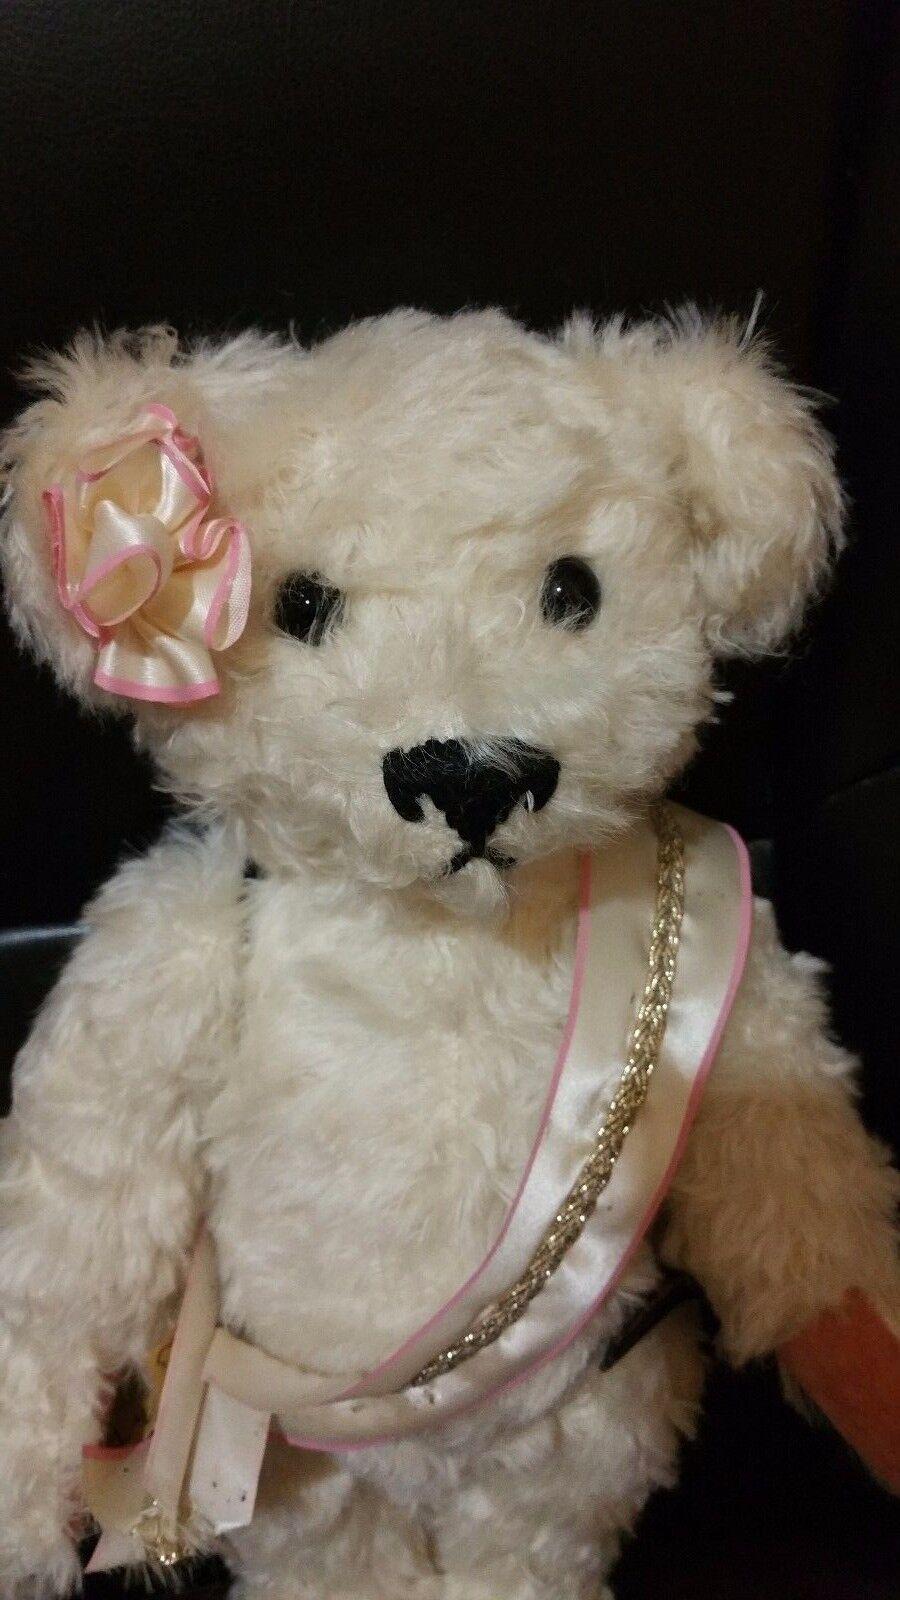 Princess 14  Wool stuffed 100% Mohair Germany Handmade Bear by Johanna Haida LMT